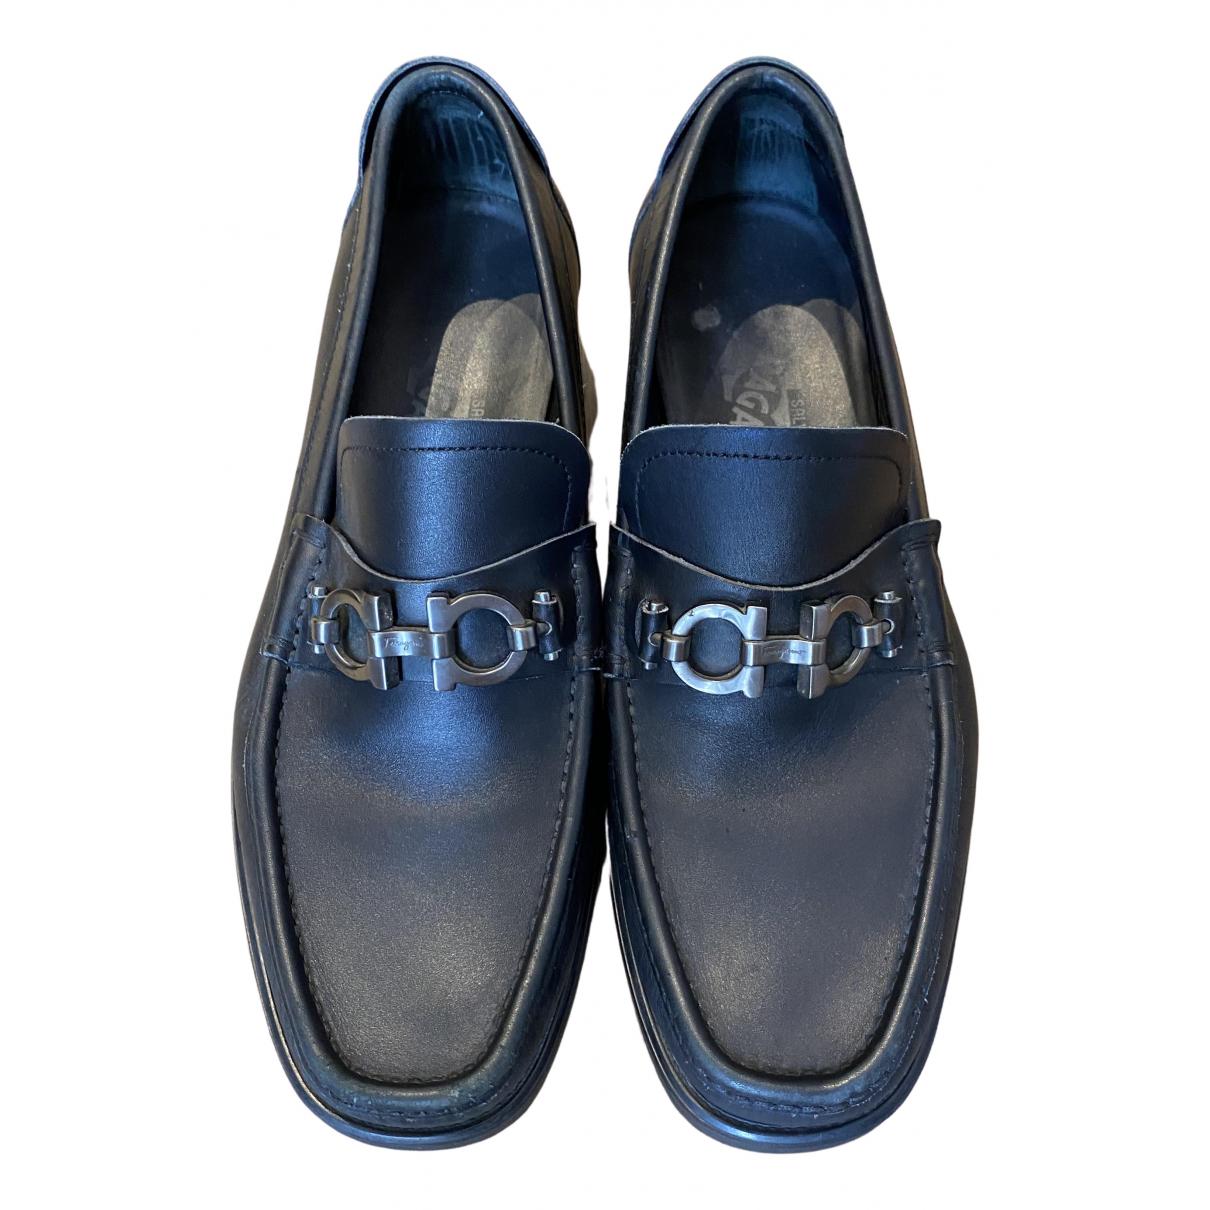 Salvatore Ferragamo \N Black Leather Flats for Men 6.5 US